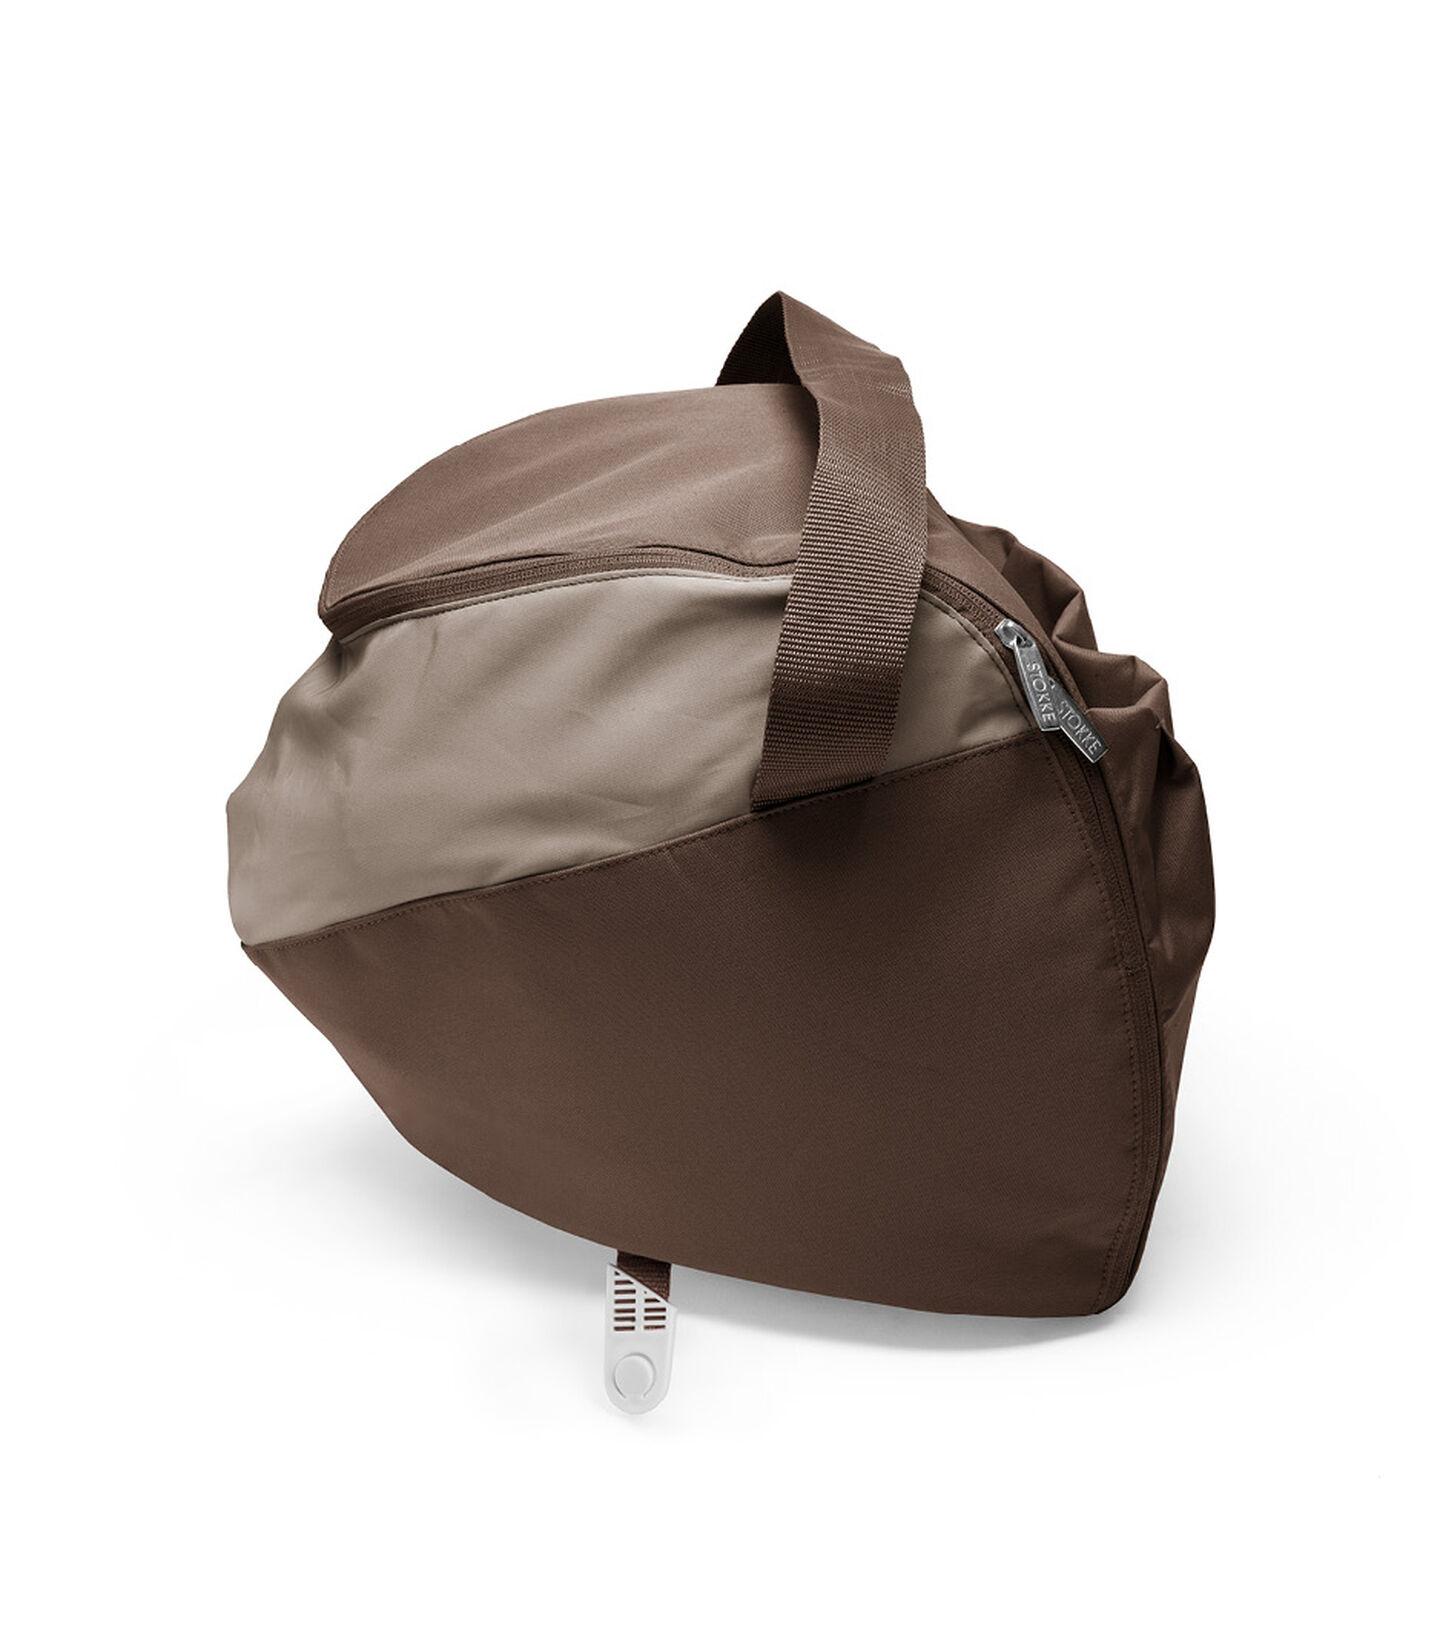 Stokke® Xplory® Einkaufstasche Brown, Brown, mainview